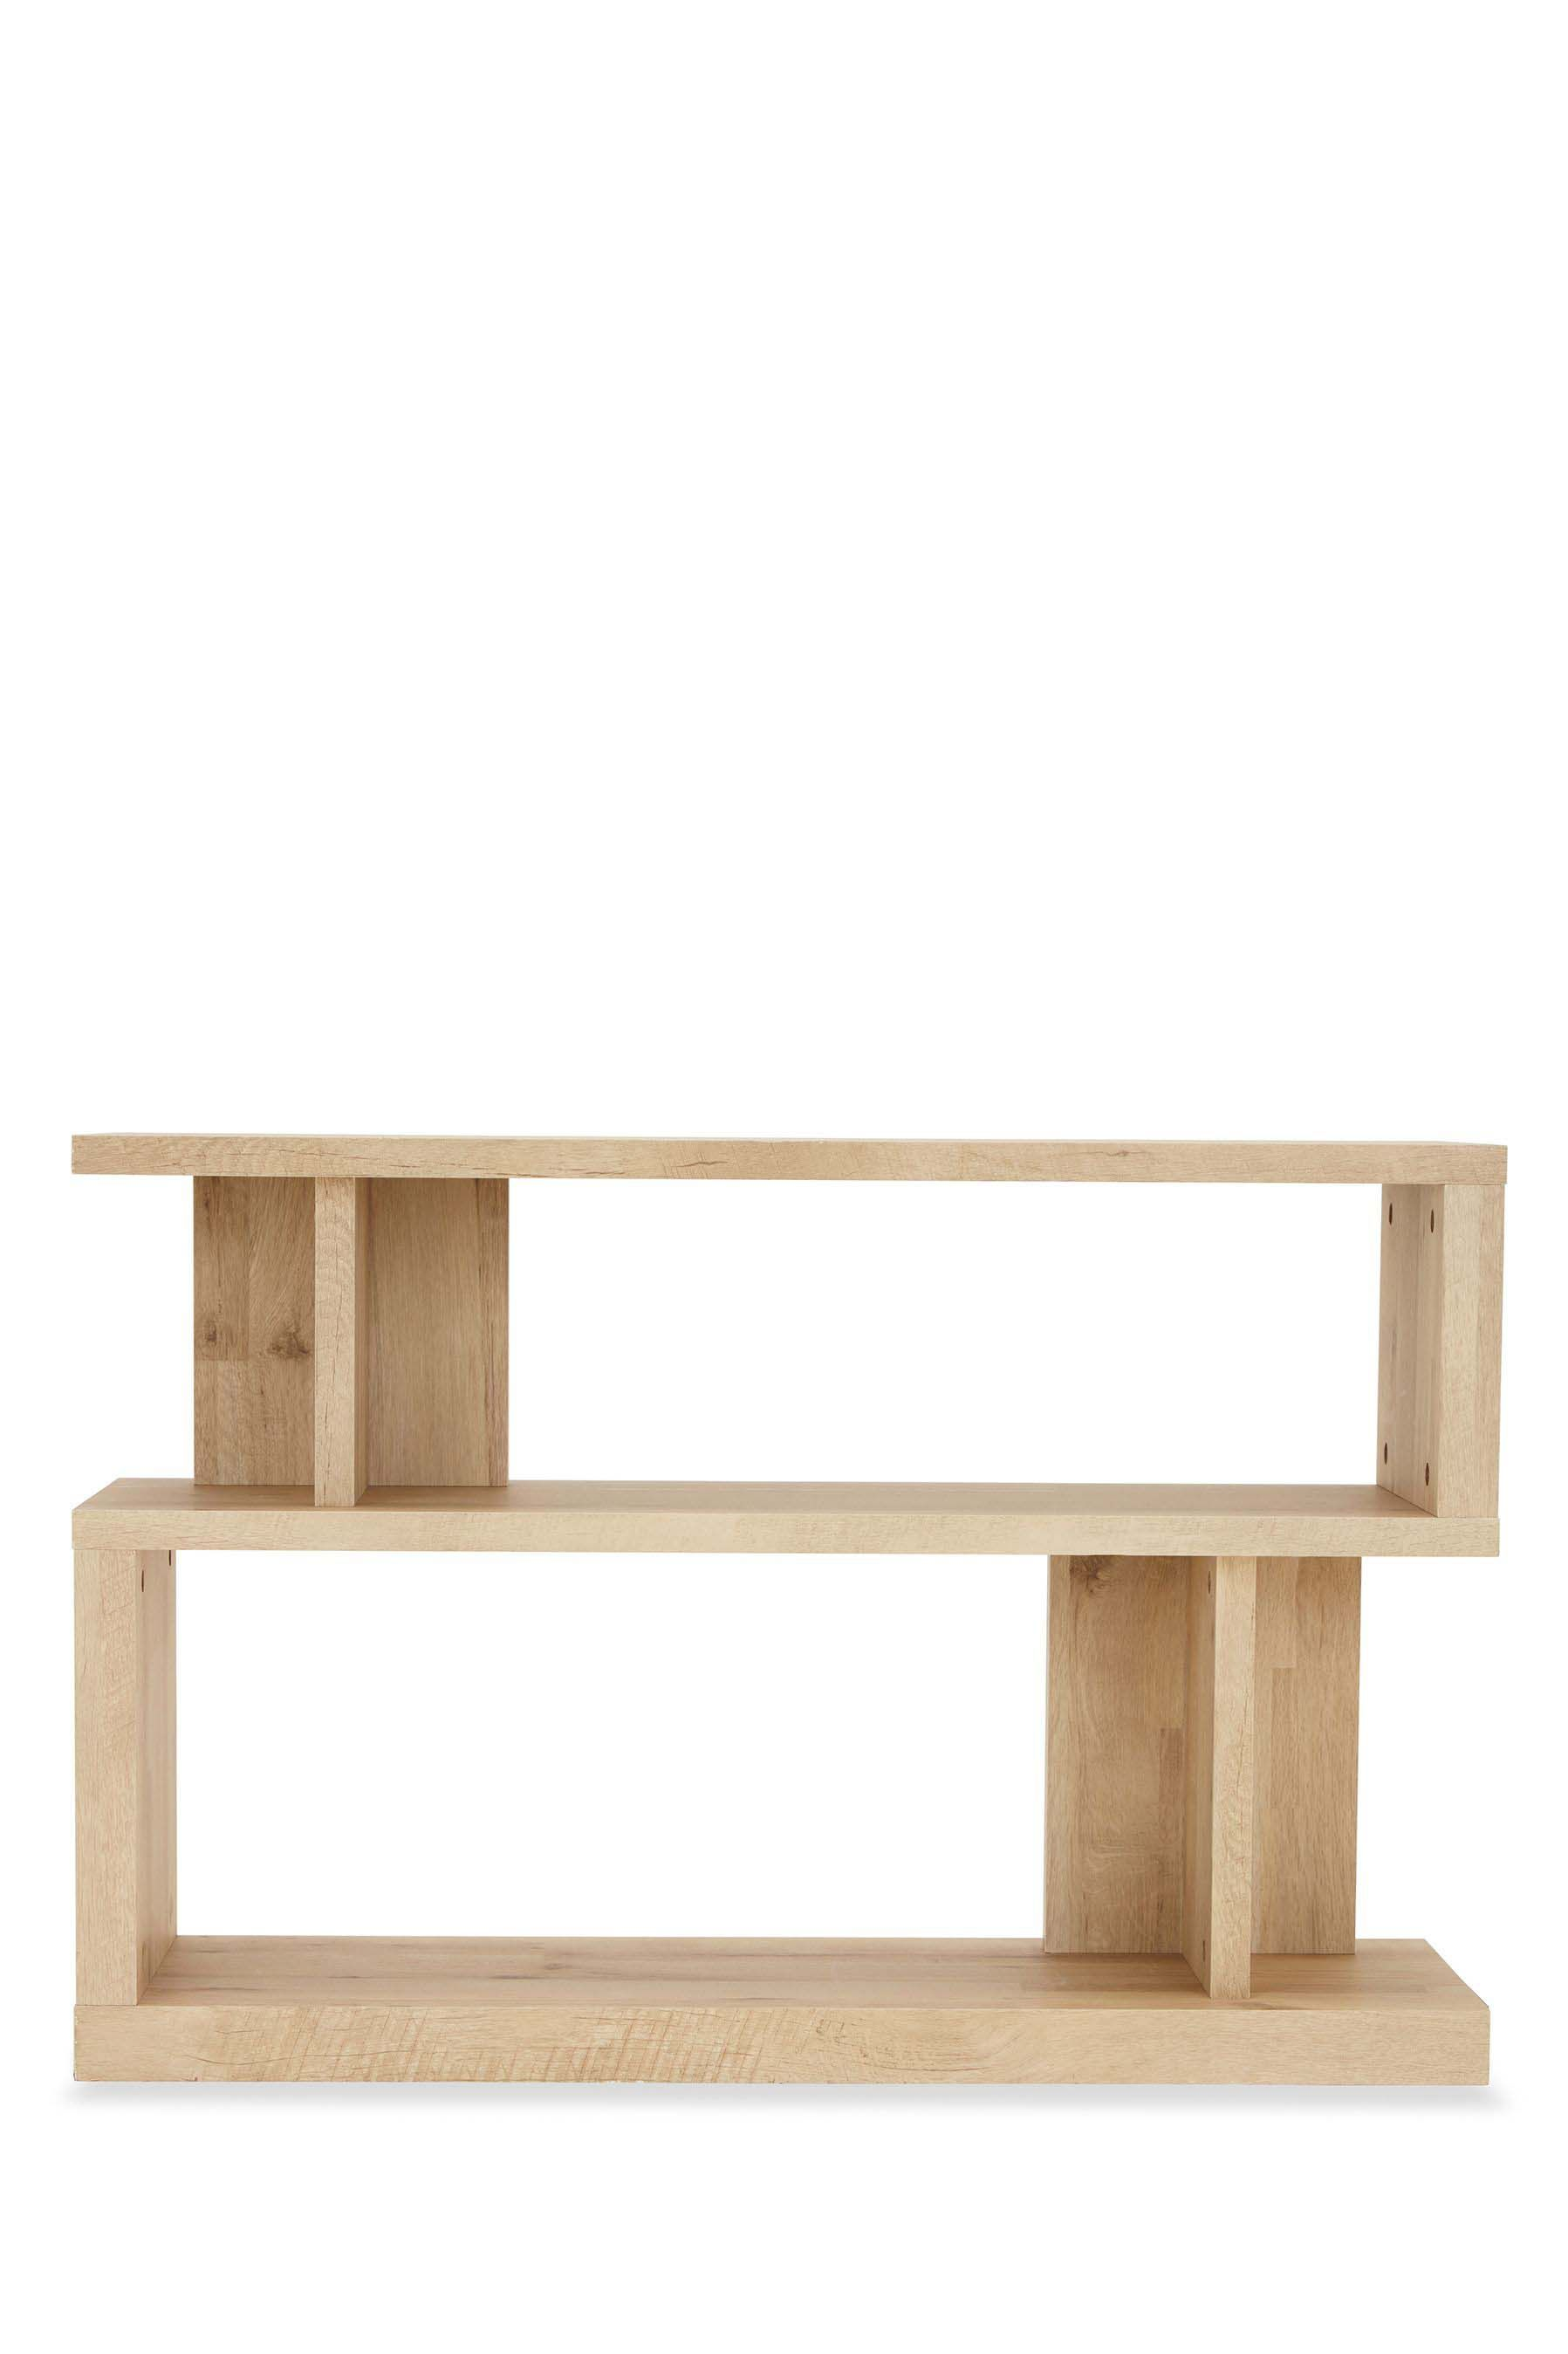 Next Bronx Sofa Side - Natural | Mattress furniture ...